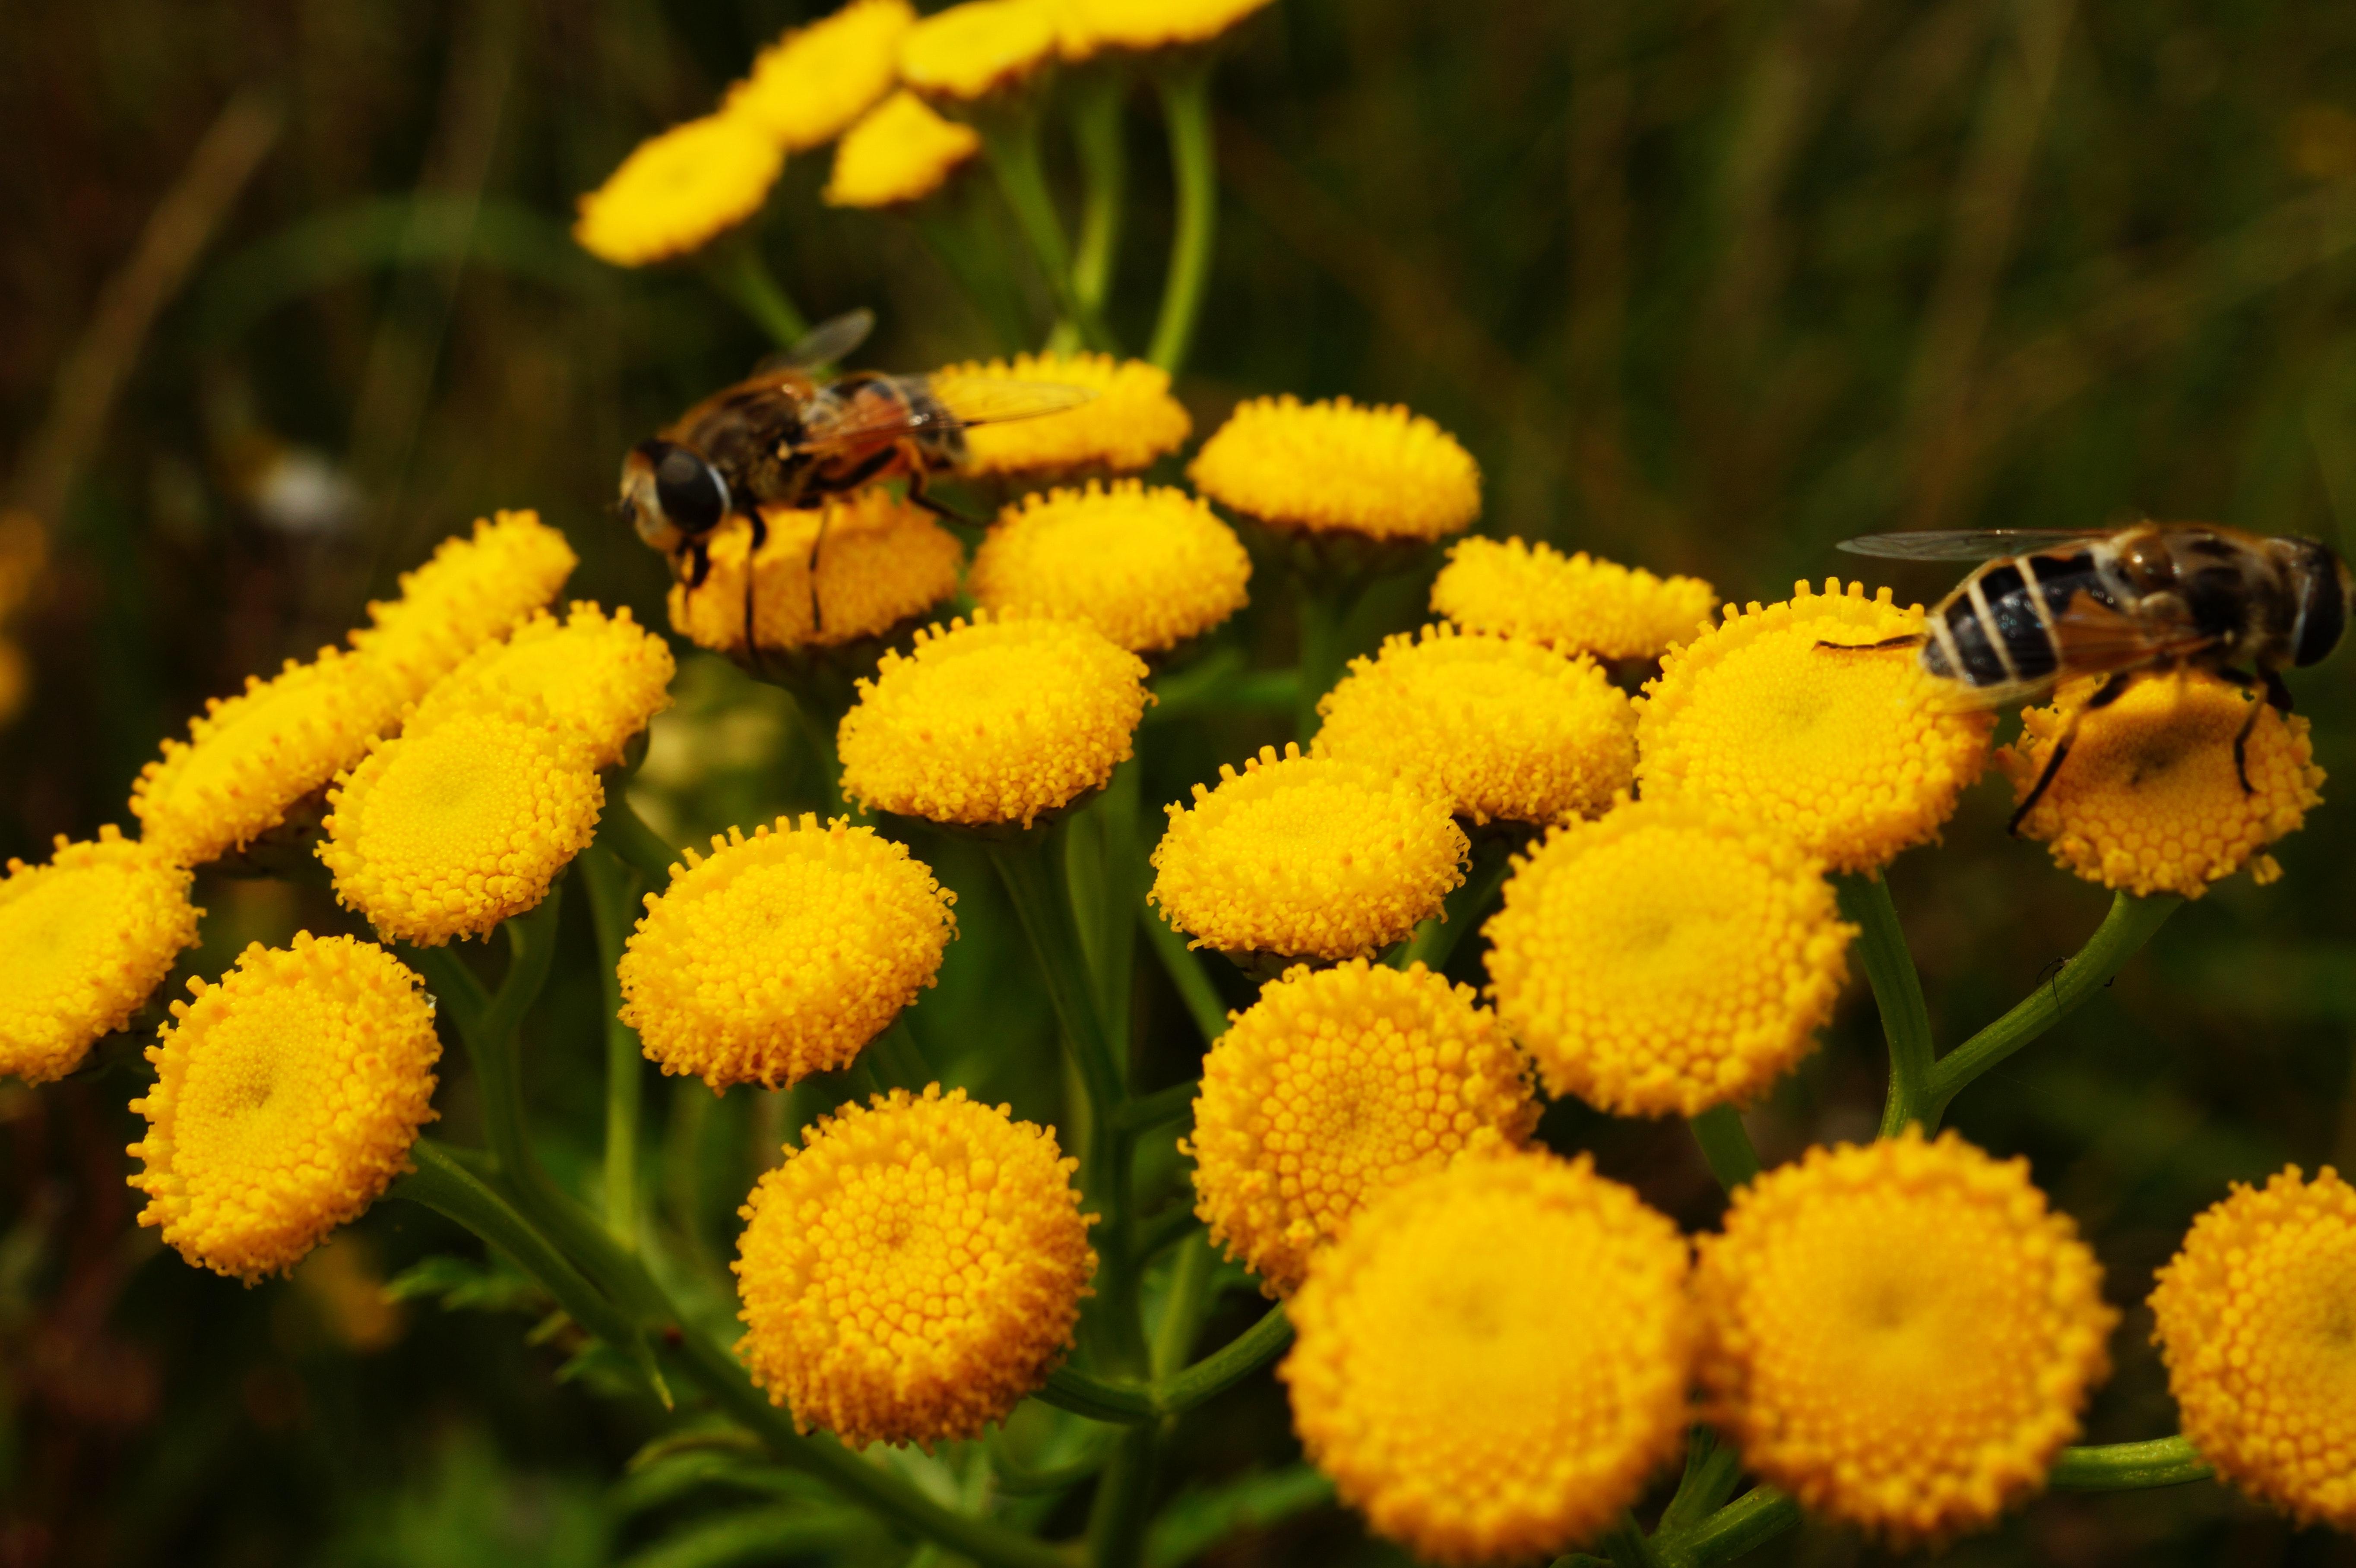 1000 Beautiful Yellow Flowers Photos Pexels Free Stock Photos